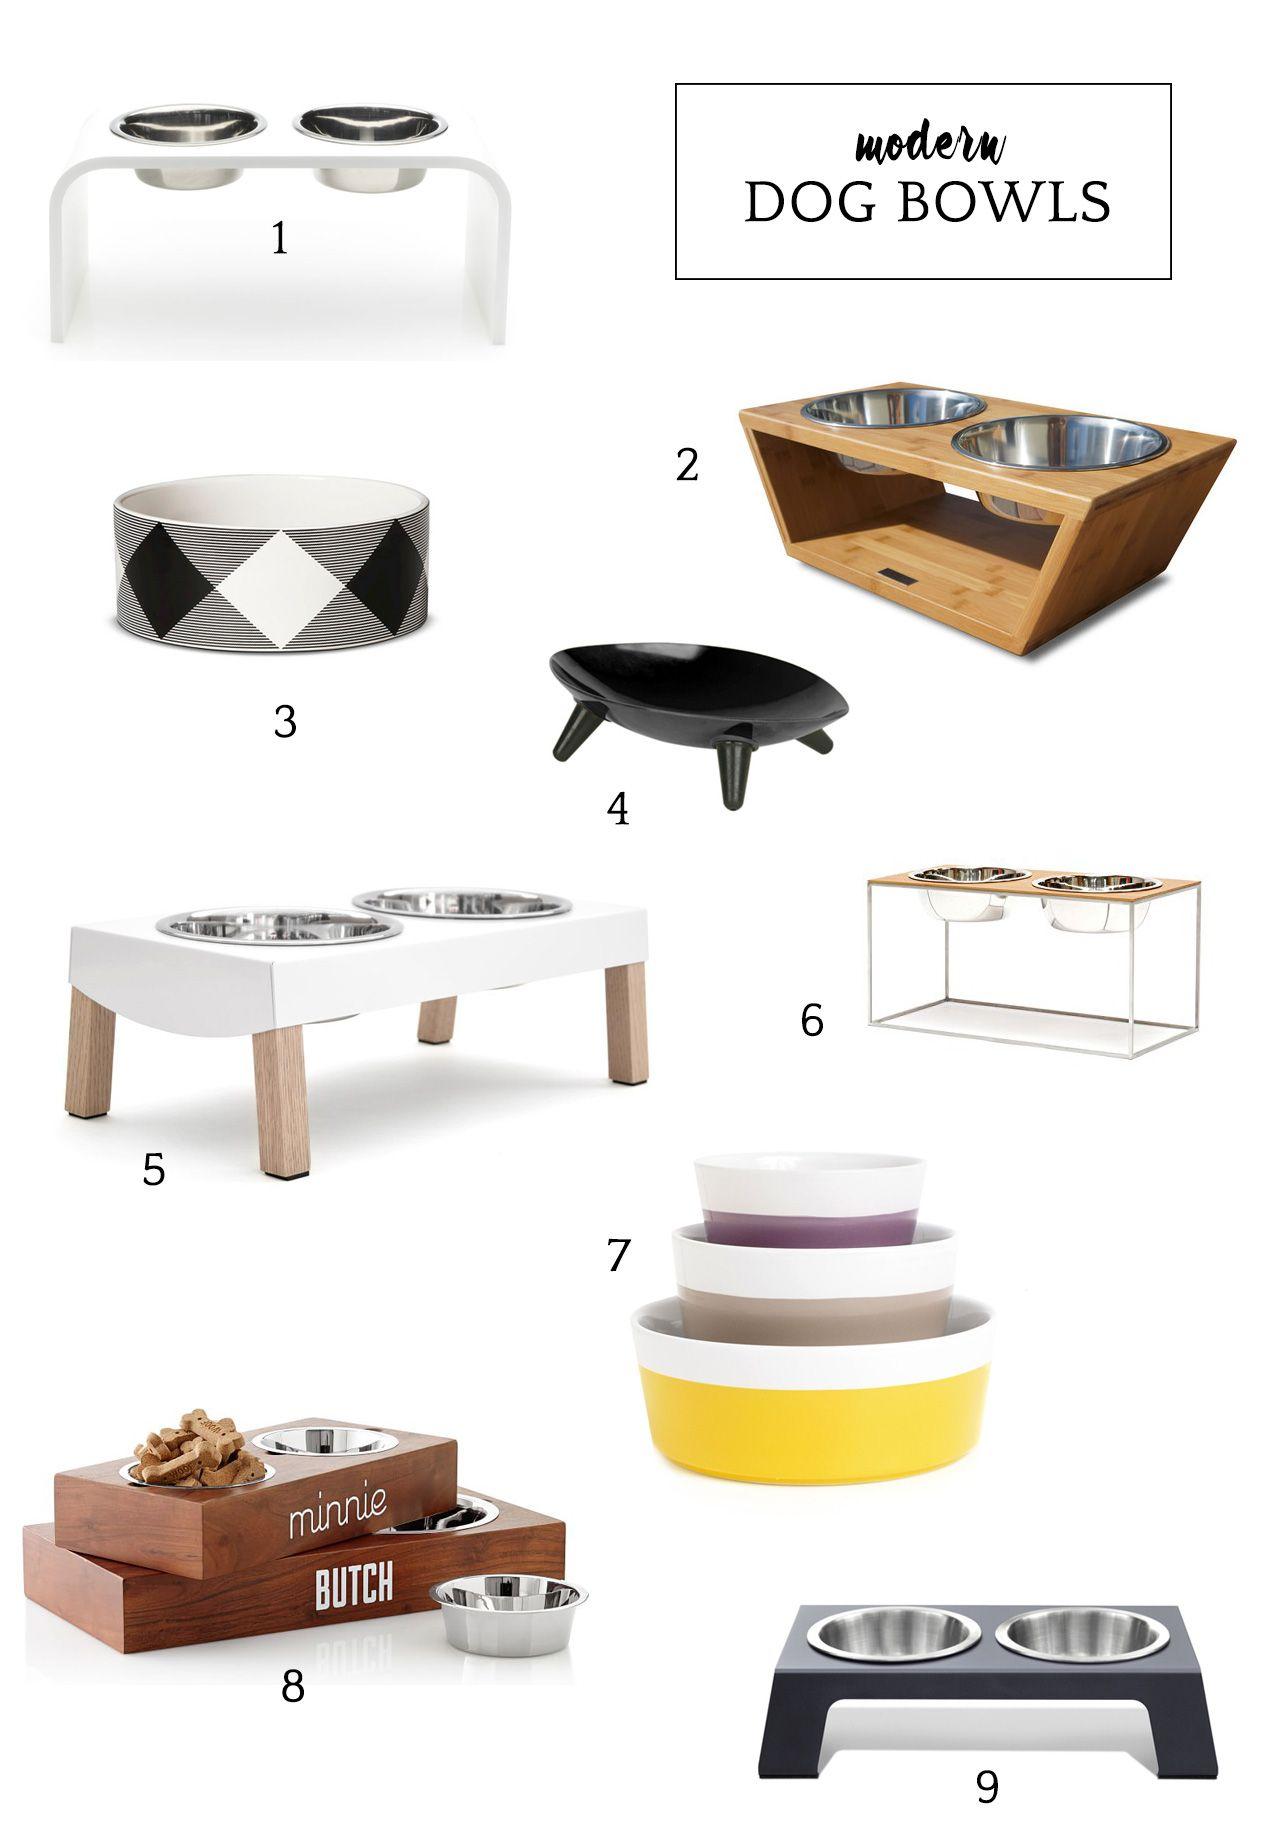 modern dog bowls  natural dog food  awesome girls and by - awesome modern dog bowls